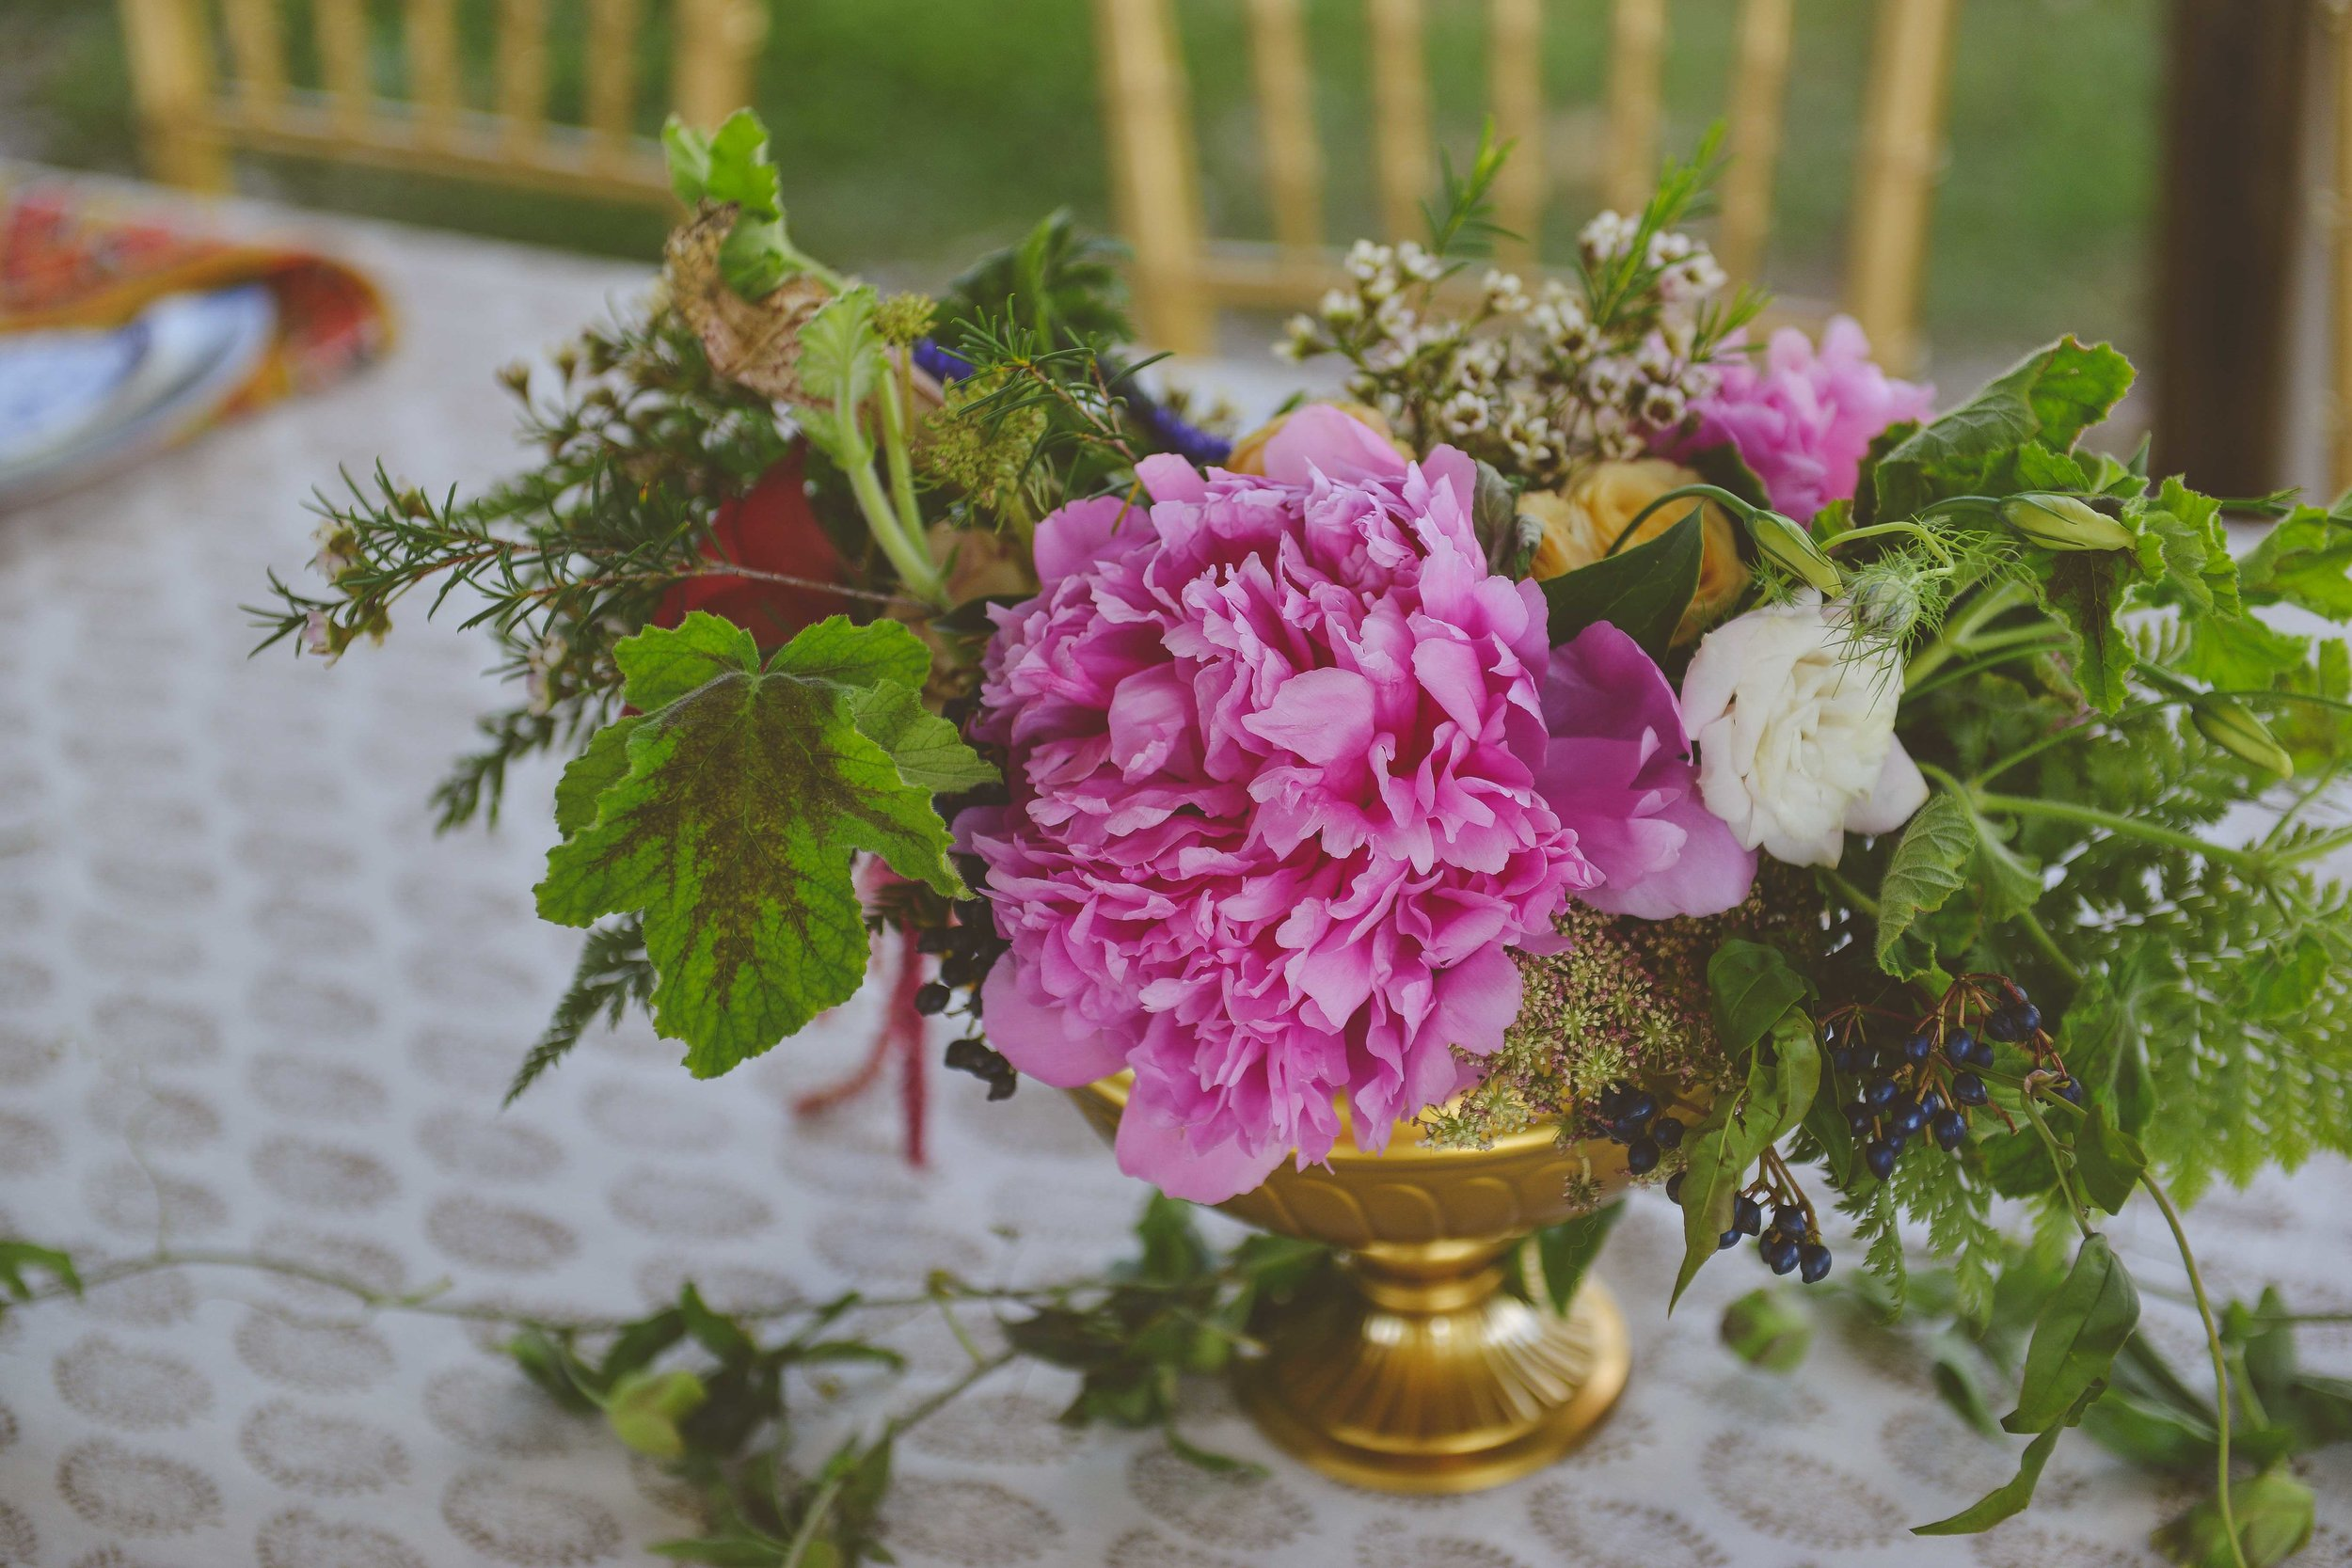 Bowerbird Flowers - table style - spring wedding